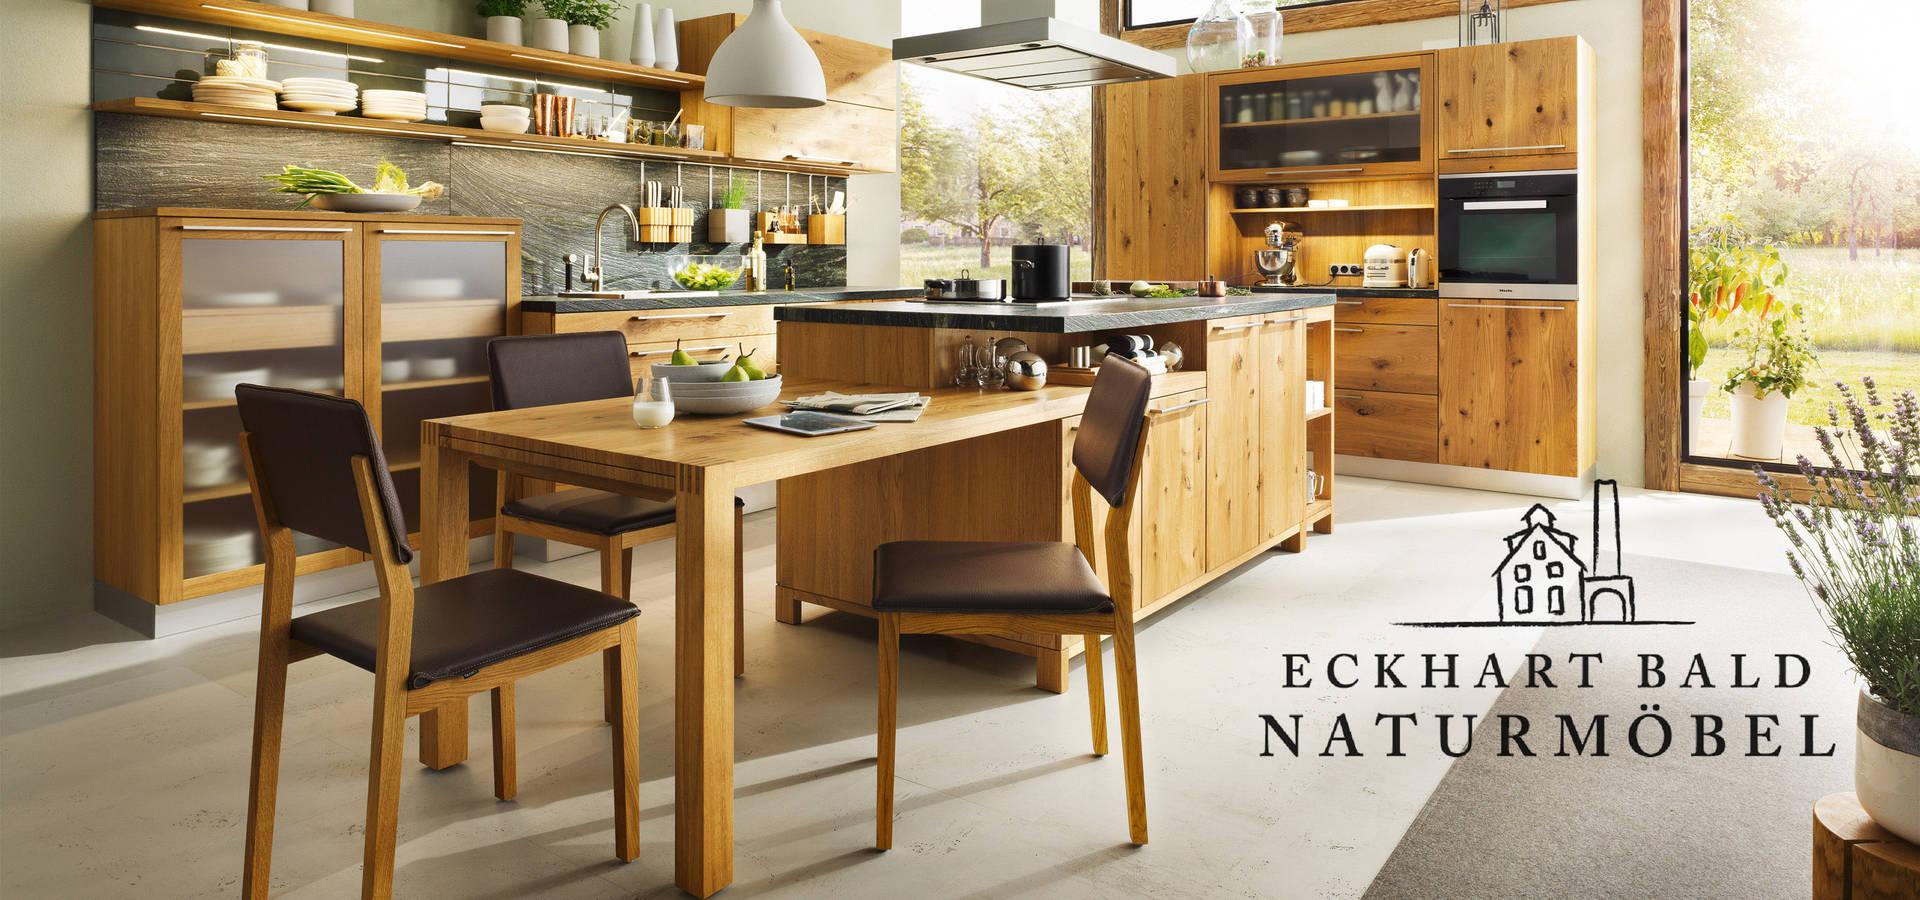 designer k chen von team 7 di eckhart bald naturm bel homify. Black Bedroom Furniture Sets. Home Design Ideas